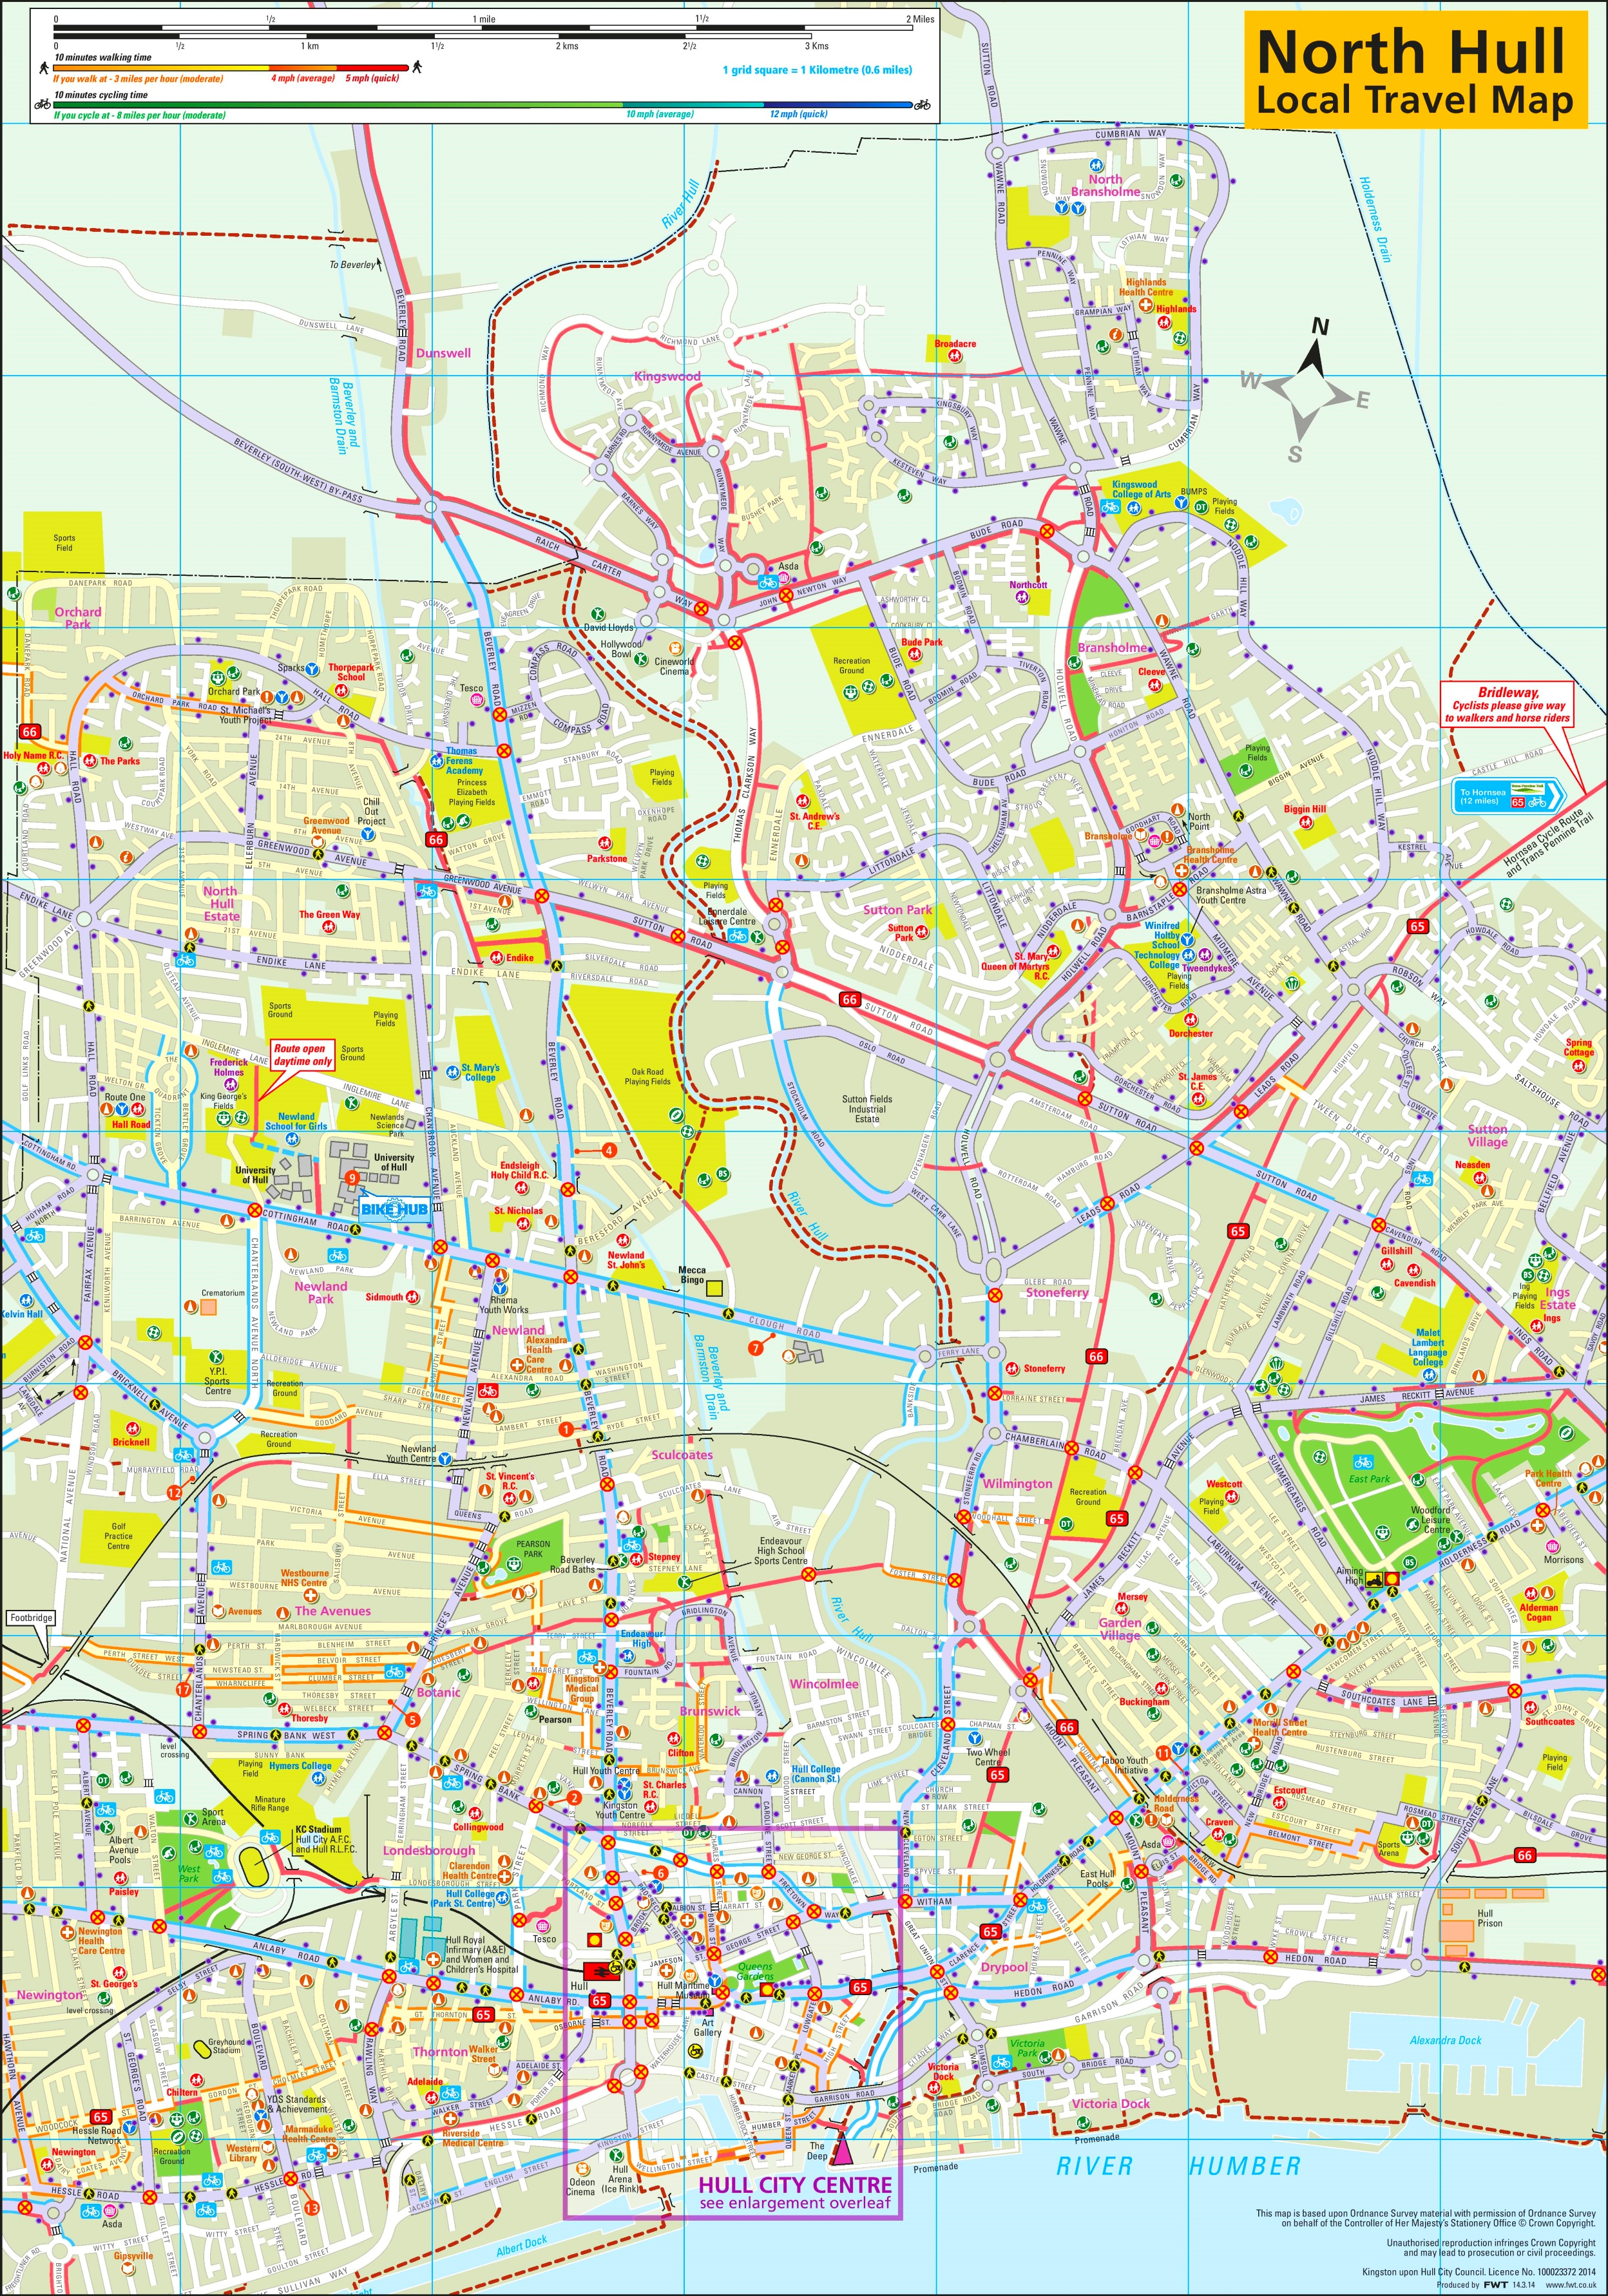 North Hull travel map